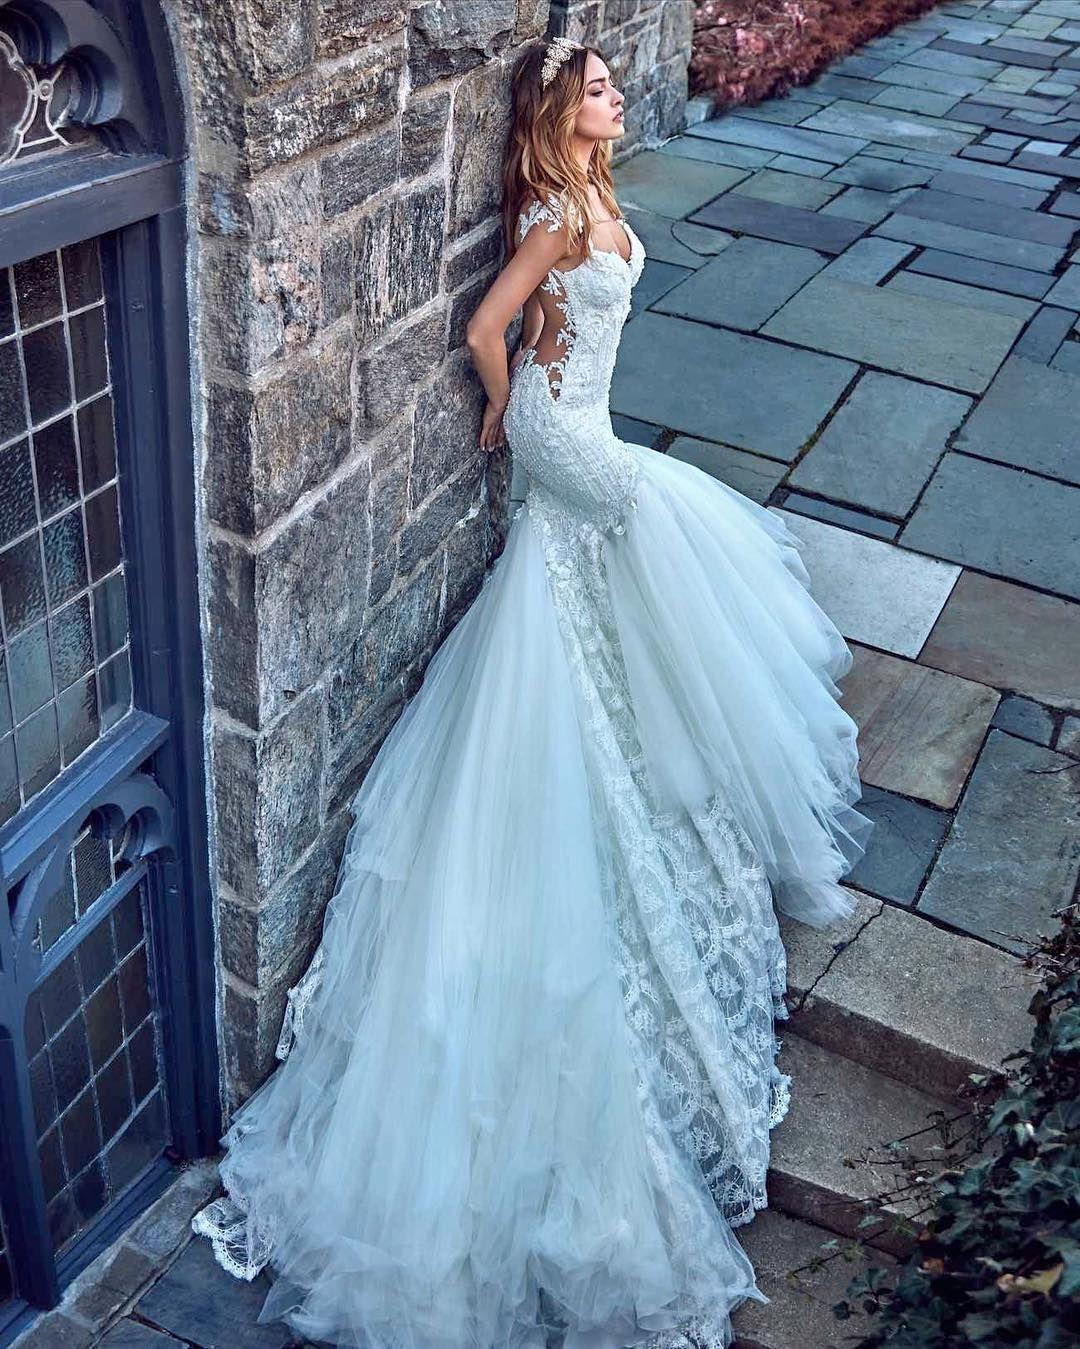 Introducing @galialahav 's 2017 Le Secret Royal Collection  See it all@on #confettidaydreams.com now  #galialahav #weddingdress #bridaldress #bridetobe #couture #lesecretroyal #galialahav2016  Photography @gregswalesart Beauty @vittoriomasecchia @mundodebianca models @merigulin @noelcapri headpieces @efratcassouto